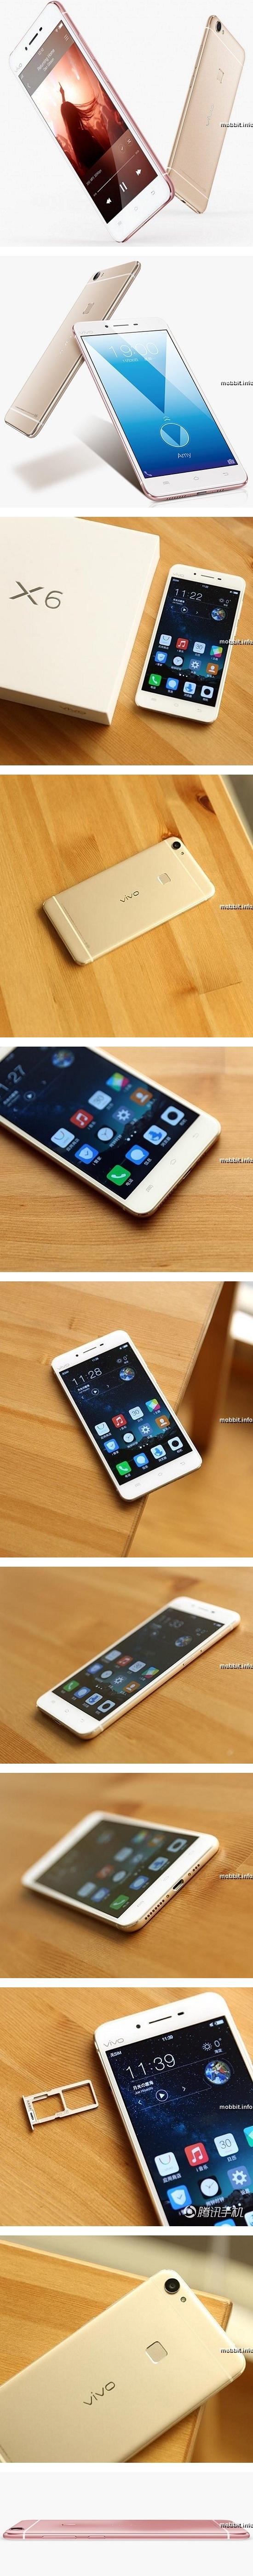 Vivo X6 и X6 Plus